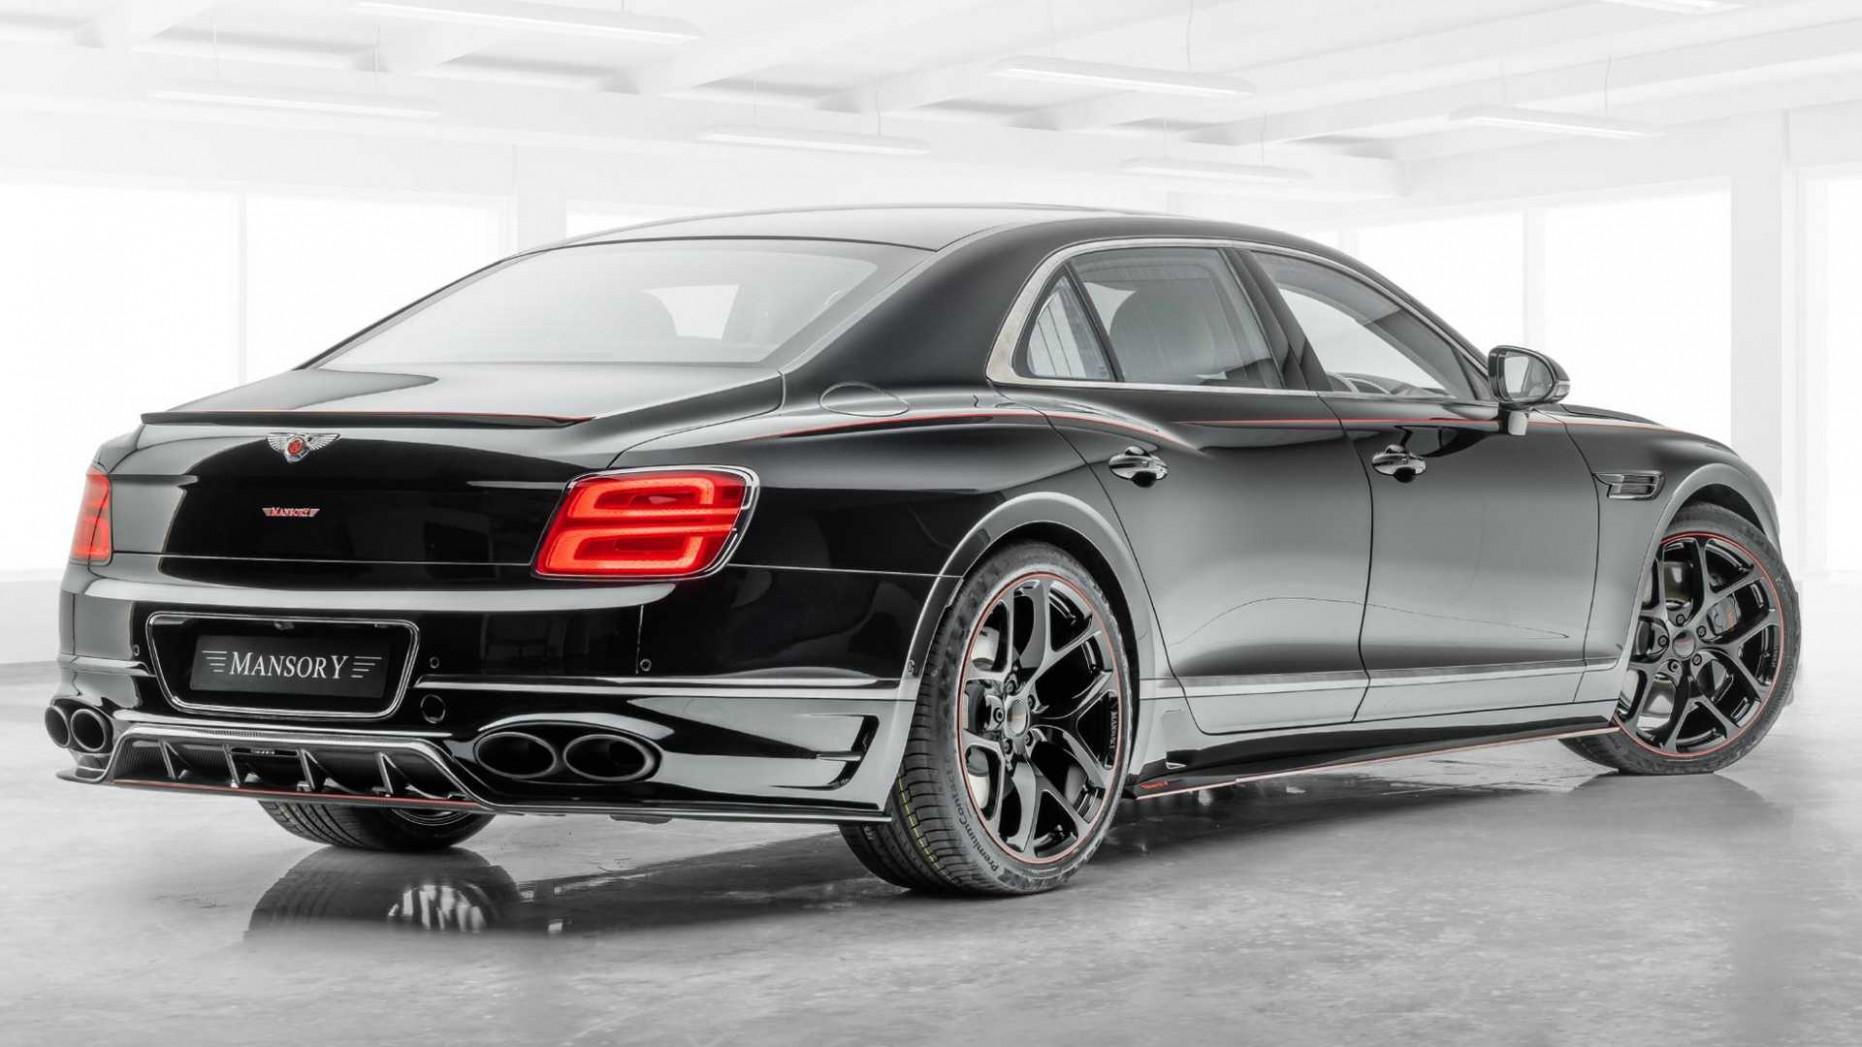 New Concept 2022 Bentley Flying Spur